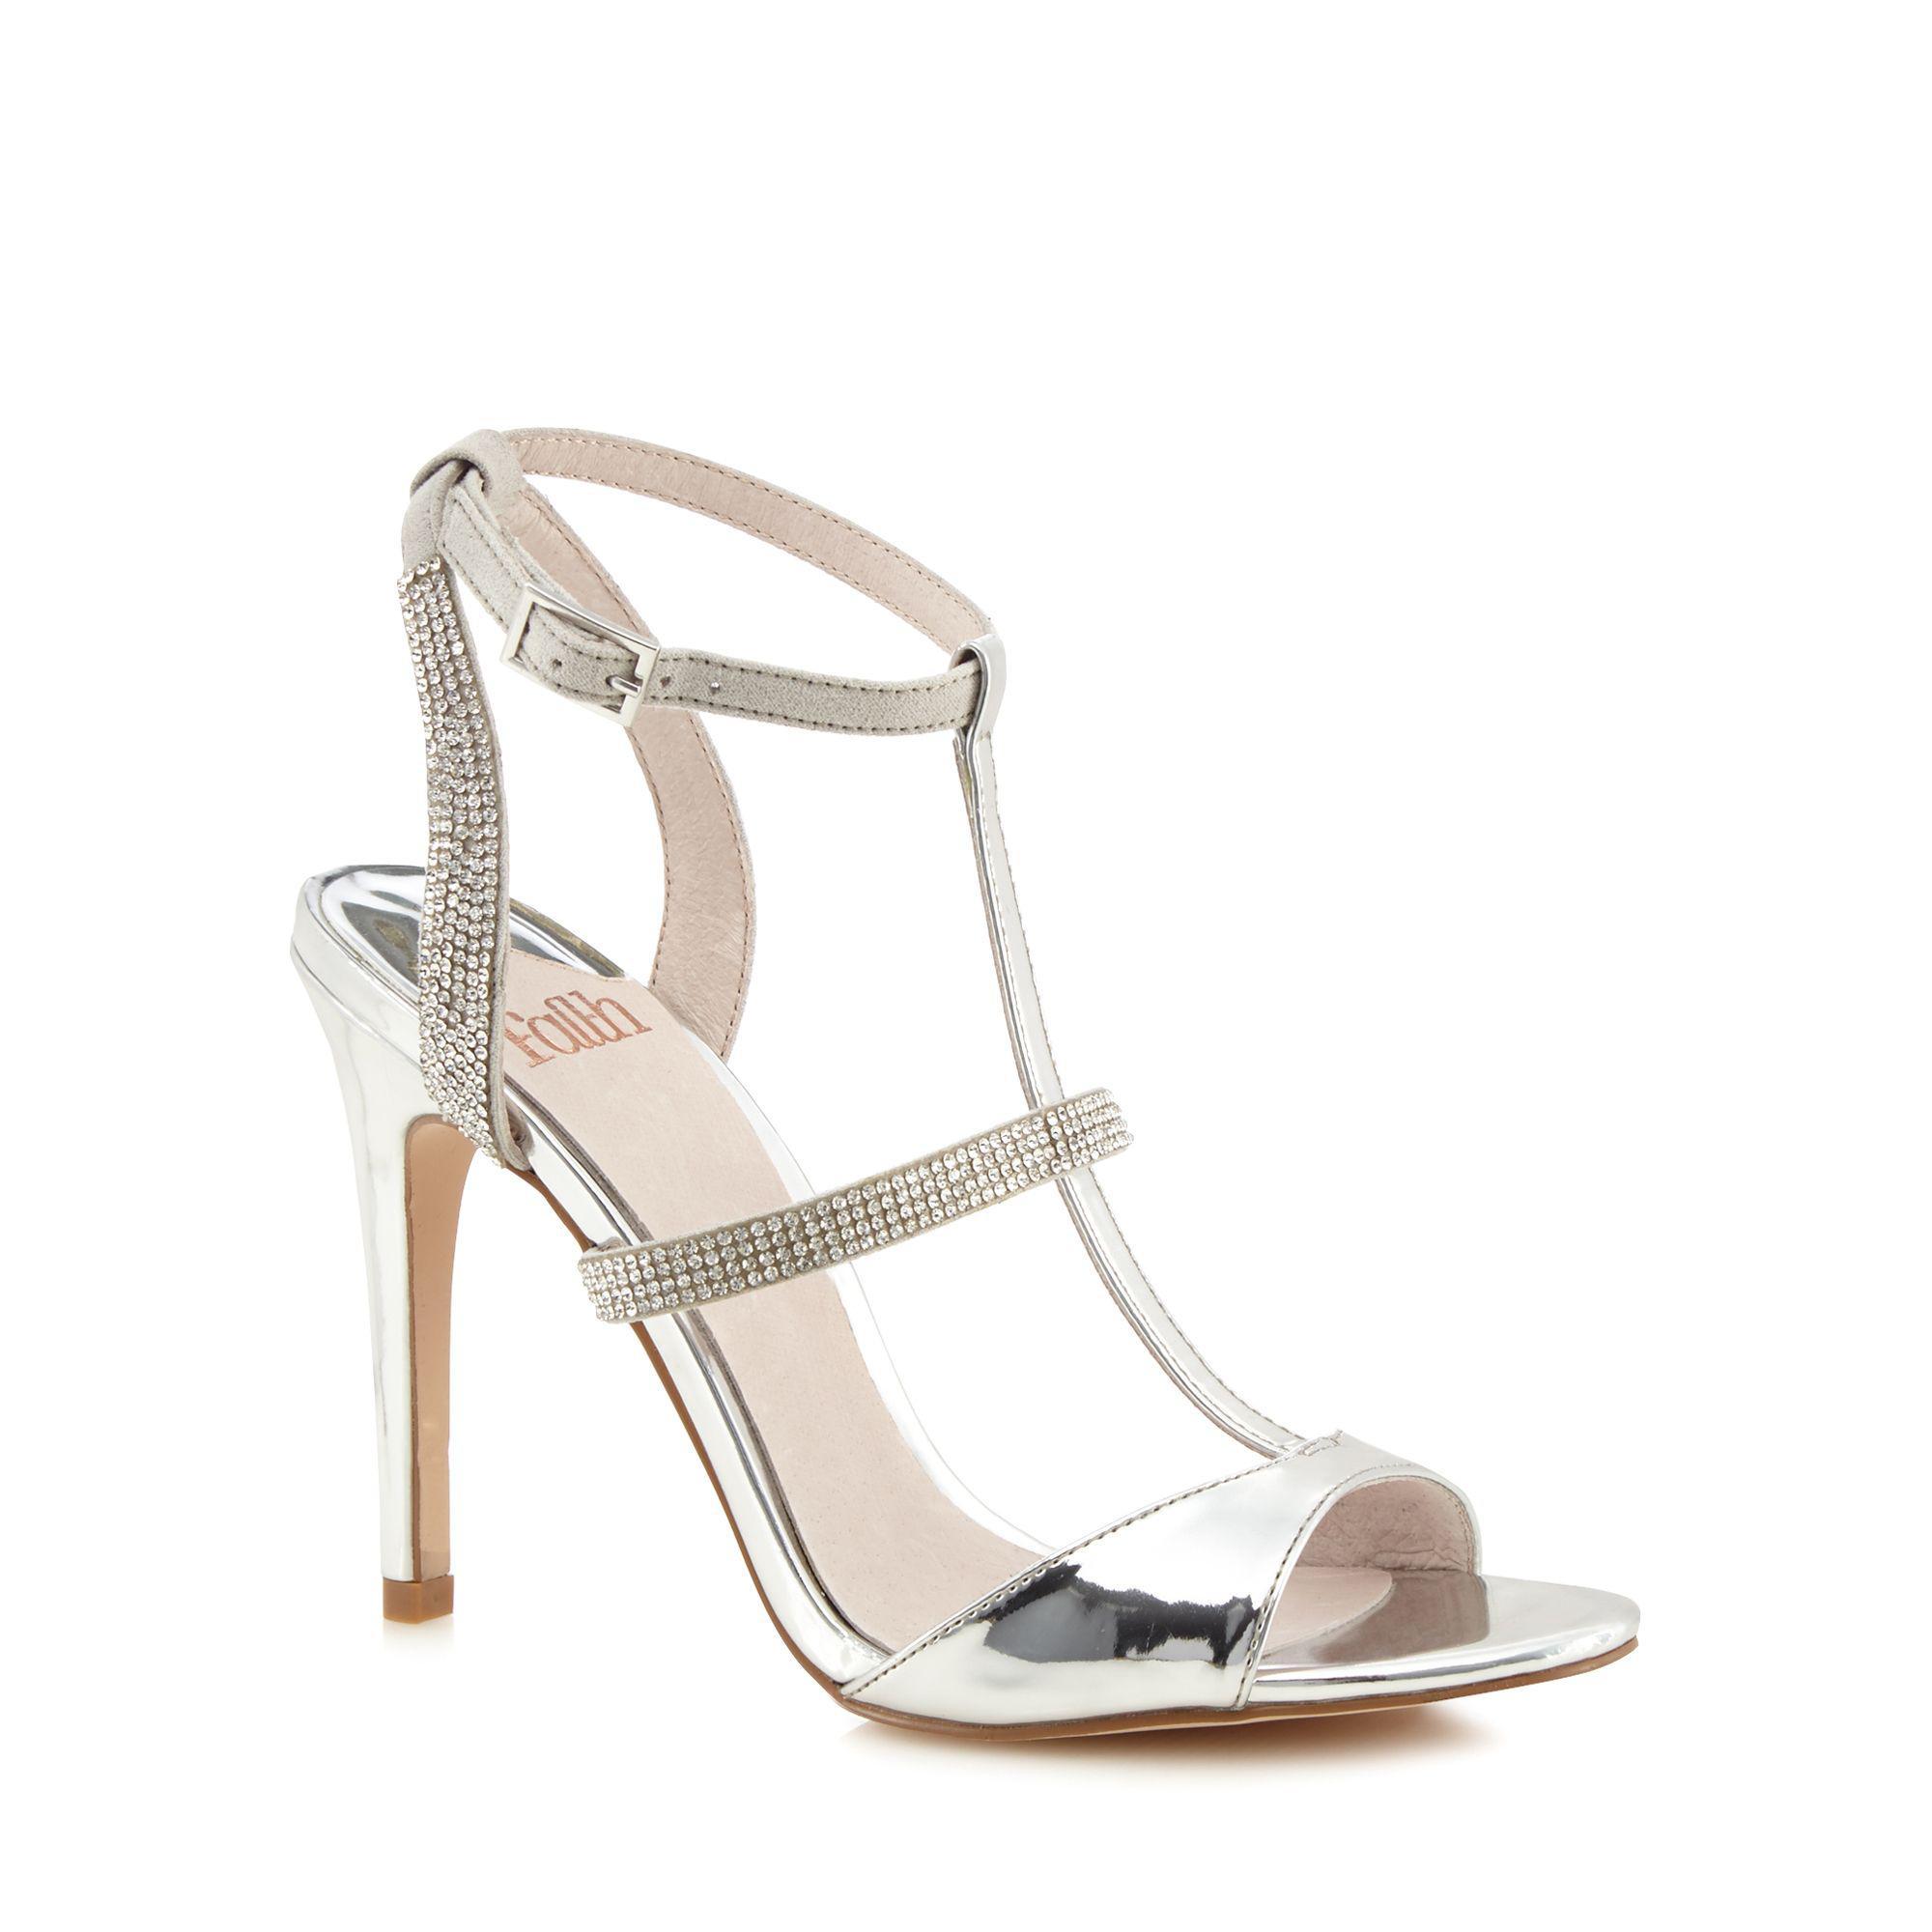 3802523f137 Faith Silver  lindsay  High Stiletto Heel T-bar Shoes in Metallic - Lyst